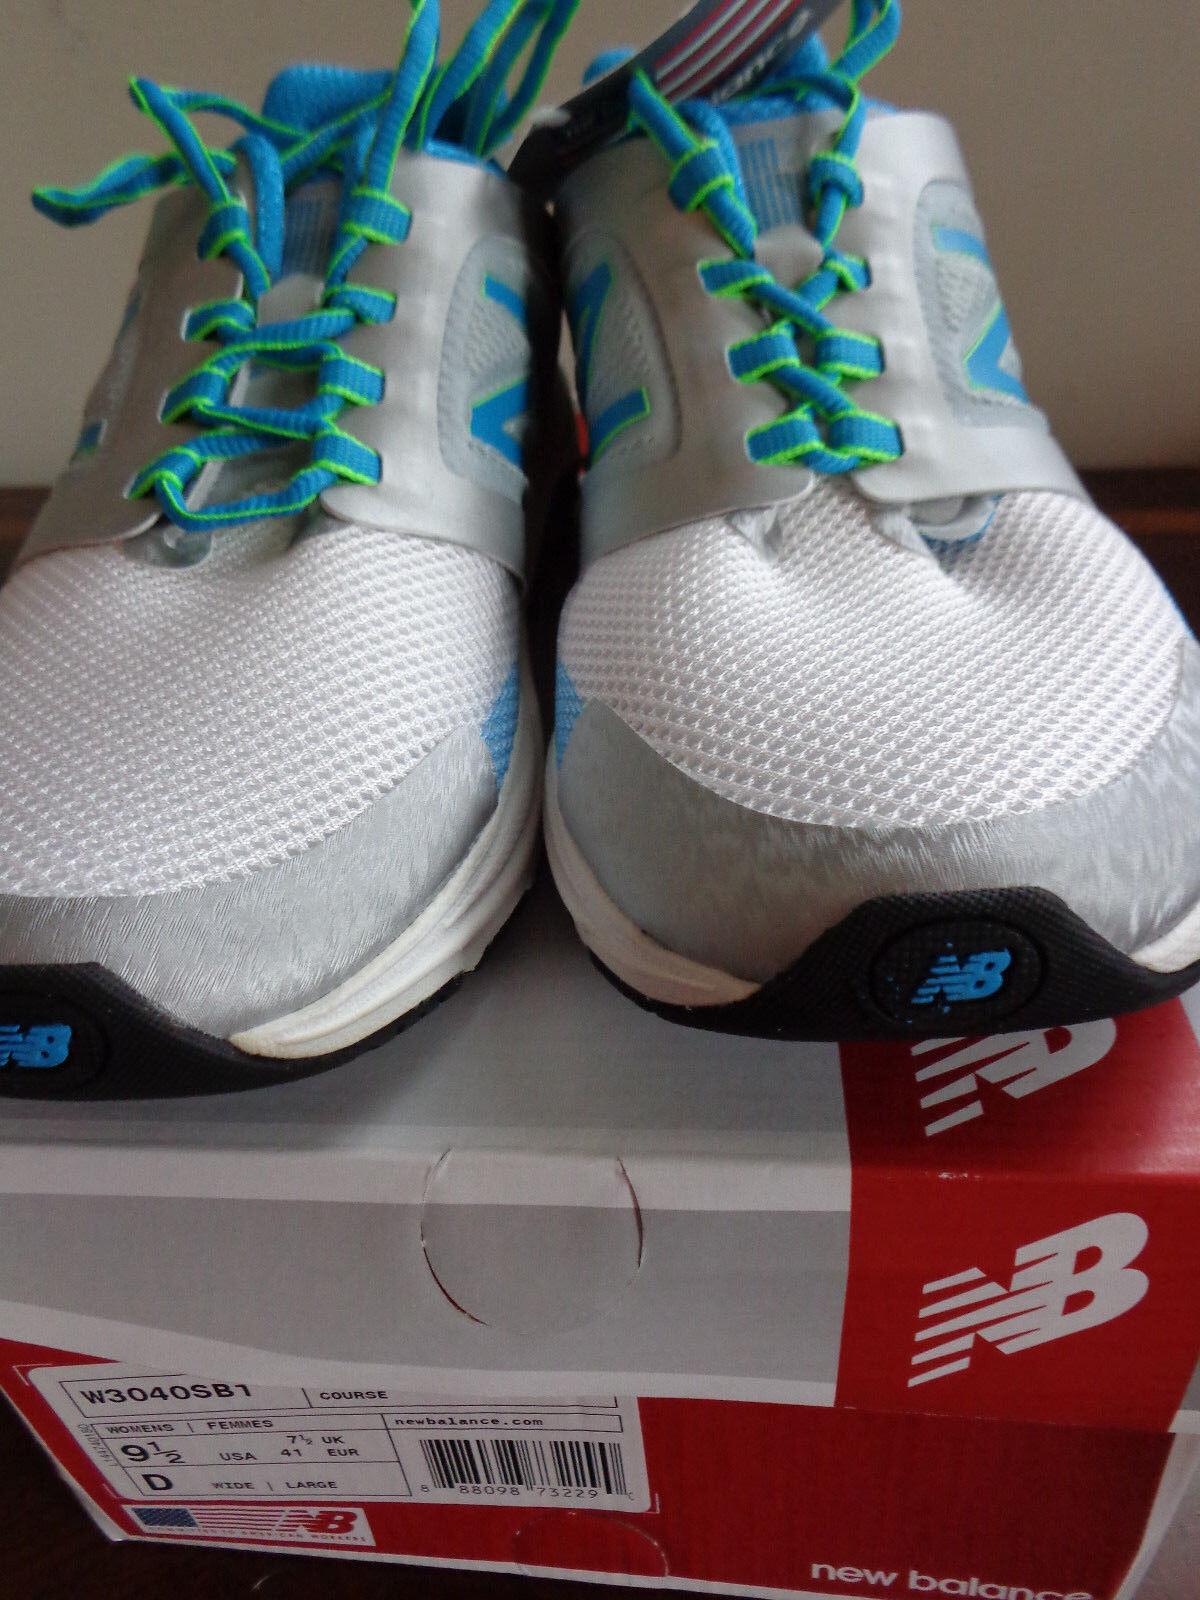 New NIB 9.5 D wide 9.5D 3040 3040V1 New balance womens shoes sneakers W3040SB1